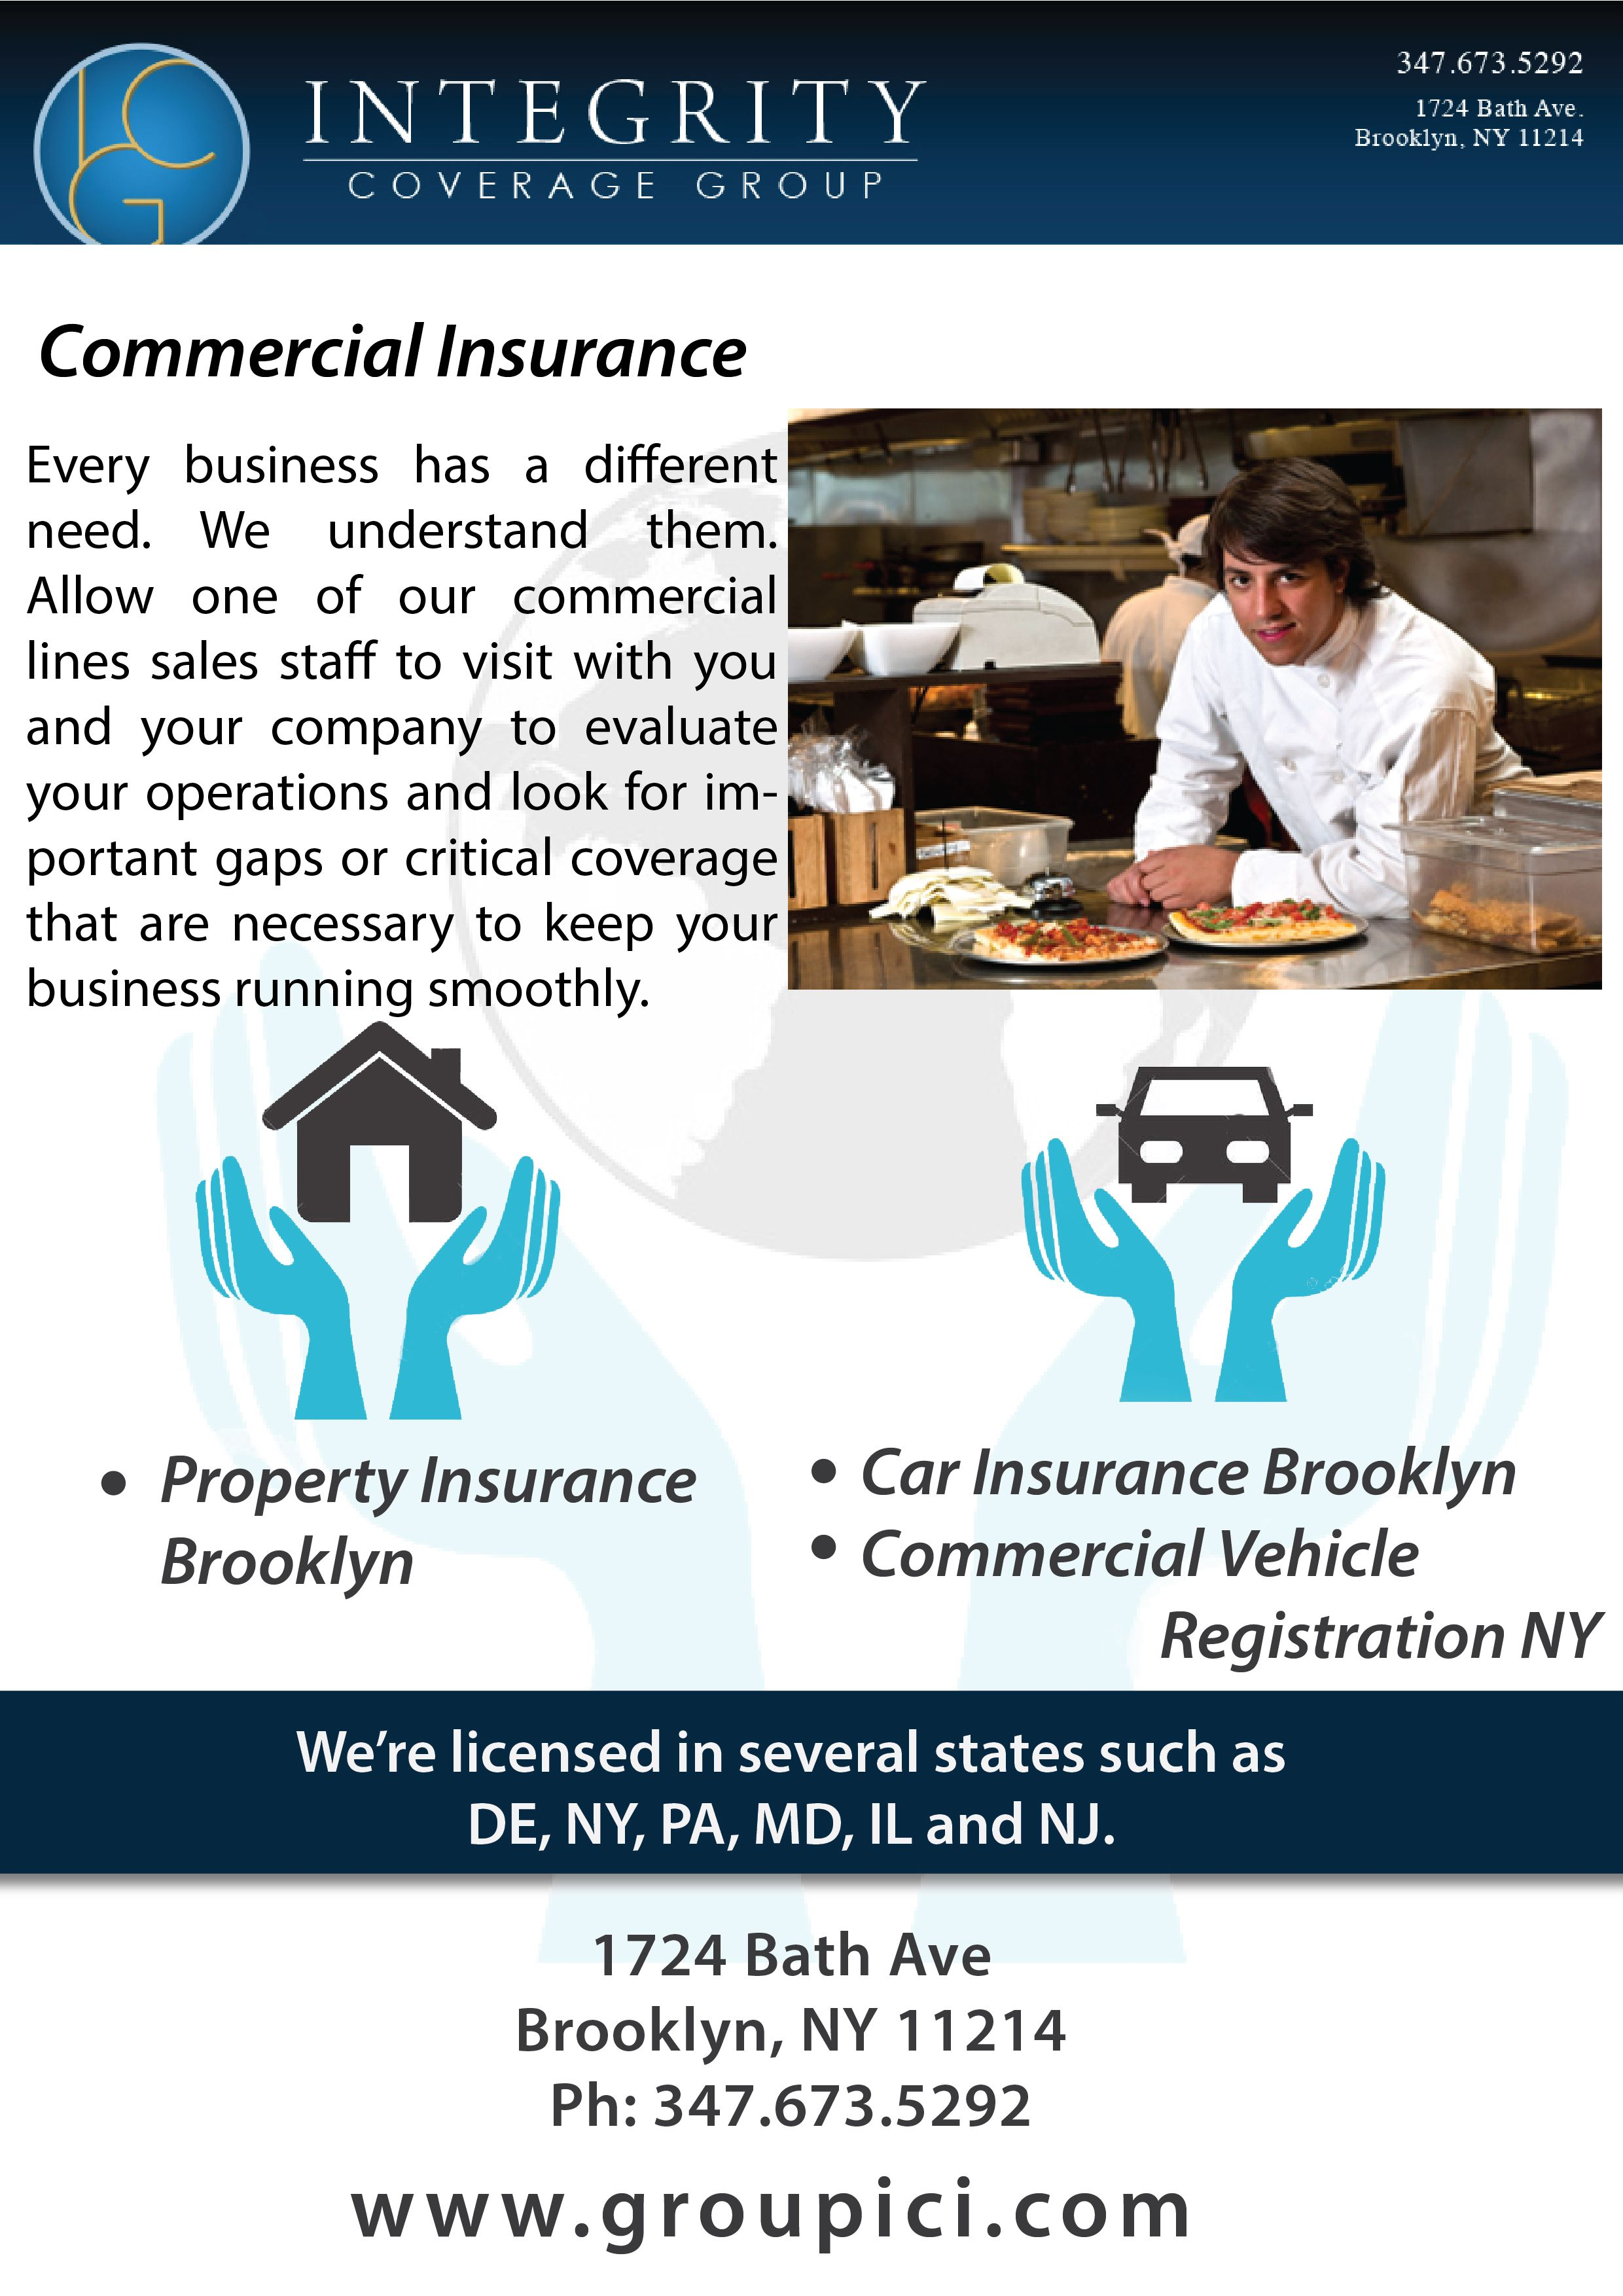 Car insurance brooklyn ny in 2020 commercial insurance